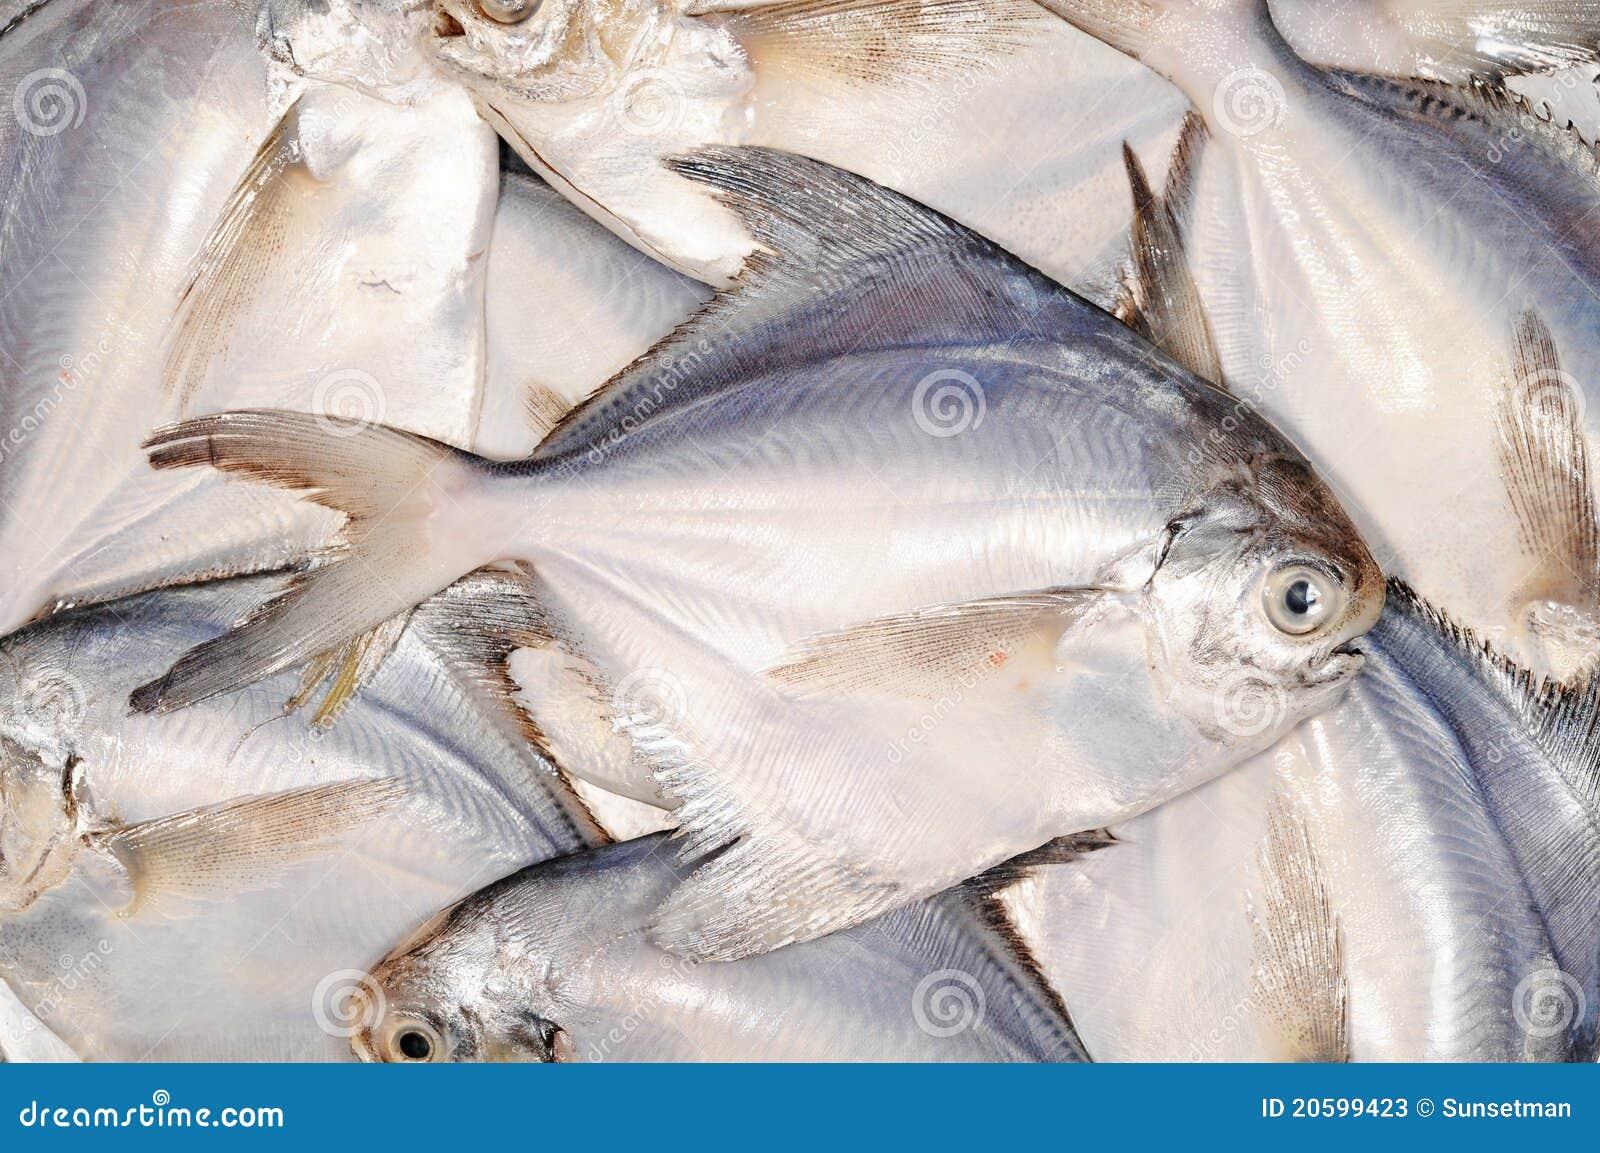 White Pomfret Fishes Stock Photos - Image: 20599423